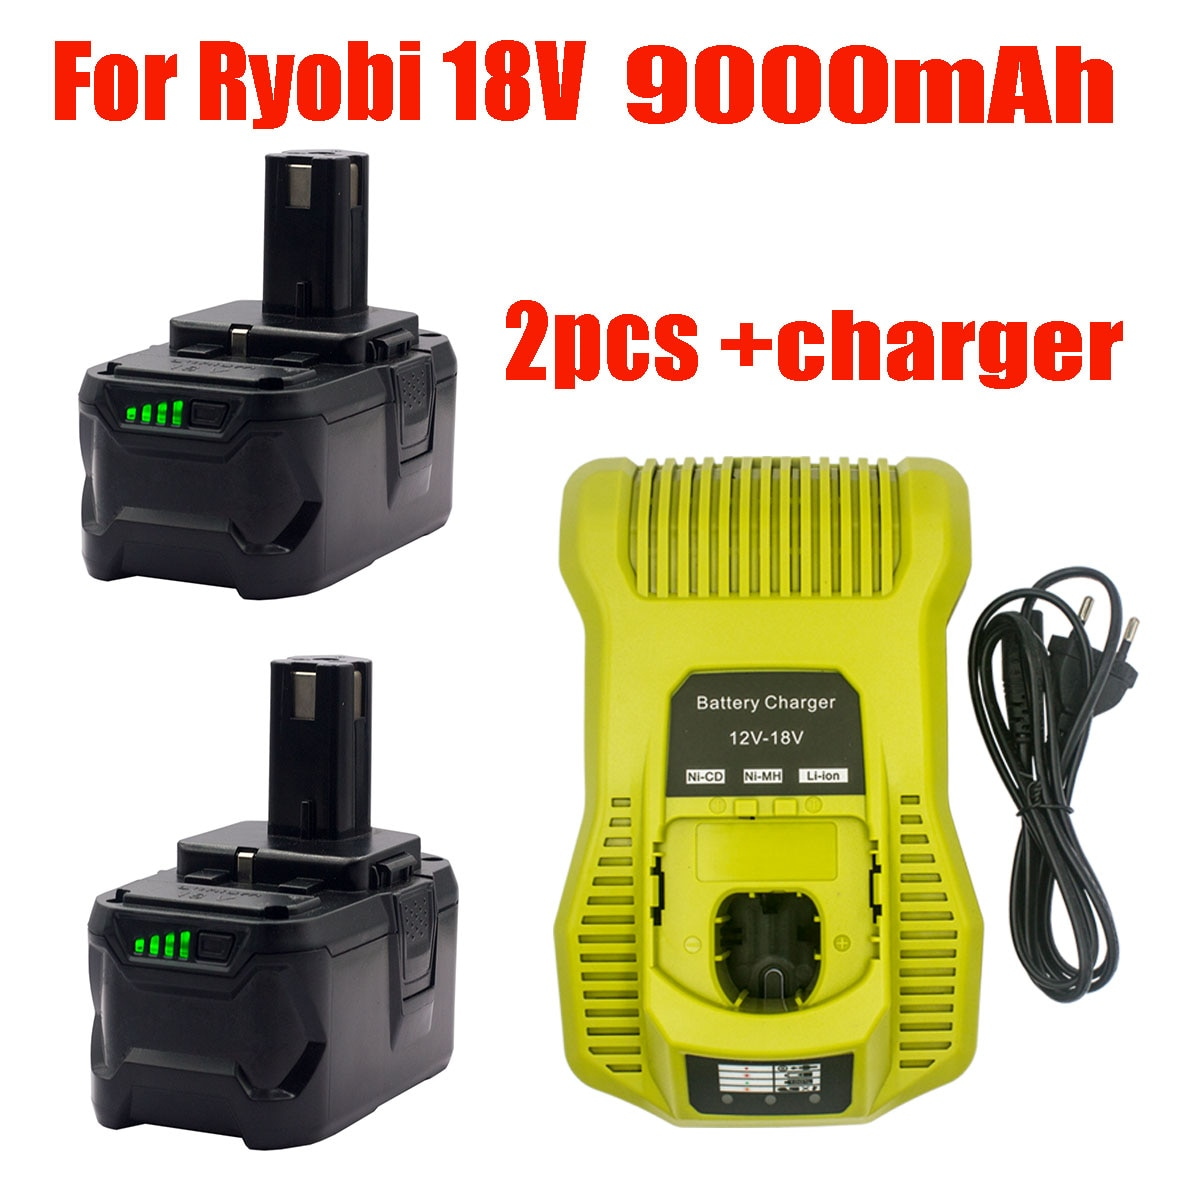 18V 9000mAh قابلة للشحن بطارية أيون الليثيوم استبدال Ryobi السلطة أداة BPL1820 P108 P109 P106 P105 P104 P103 RB18L50 البطارية